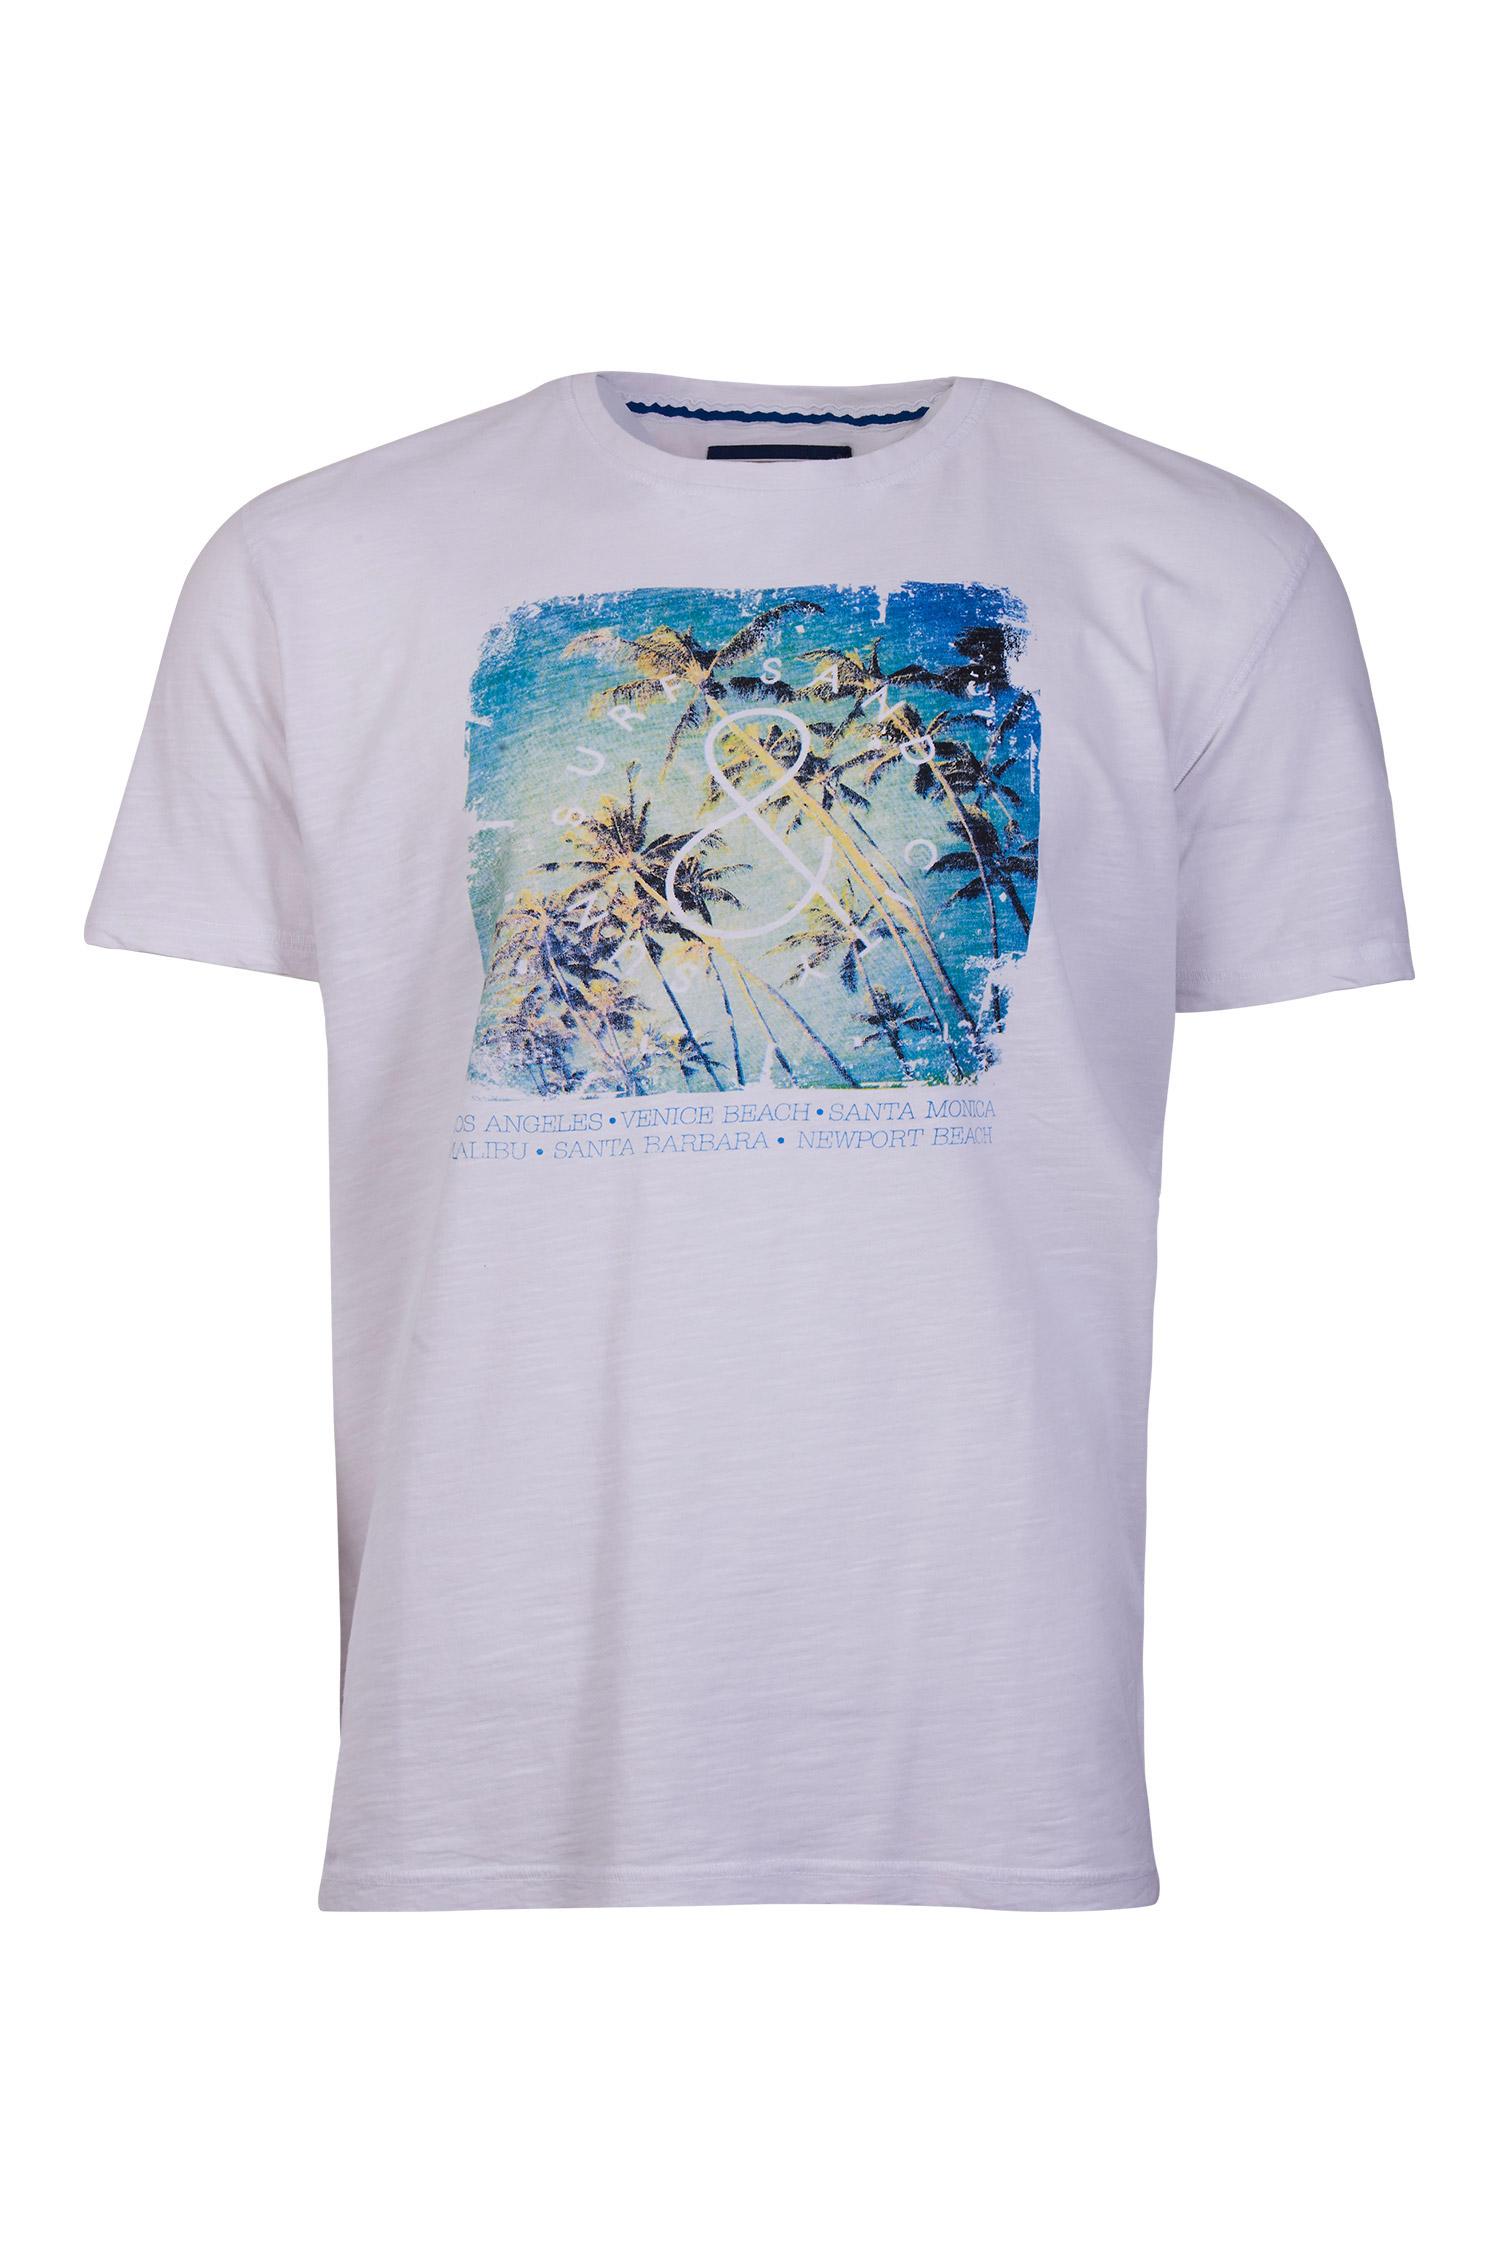 Sport, Camisetas M. Corta, 107925, BLANCO | Zoom